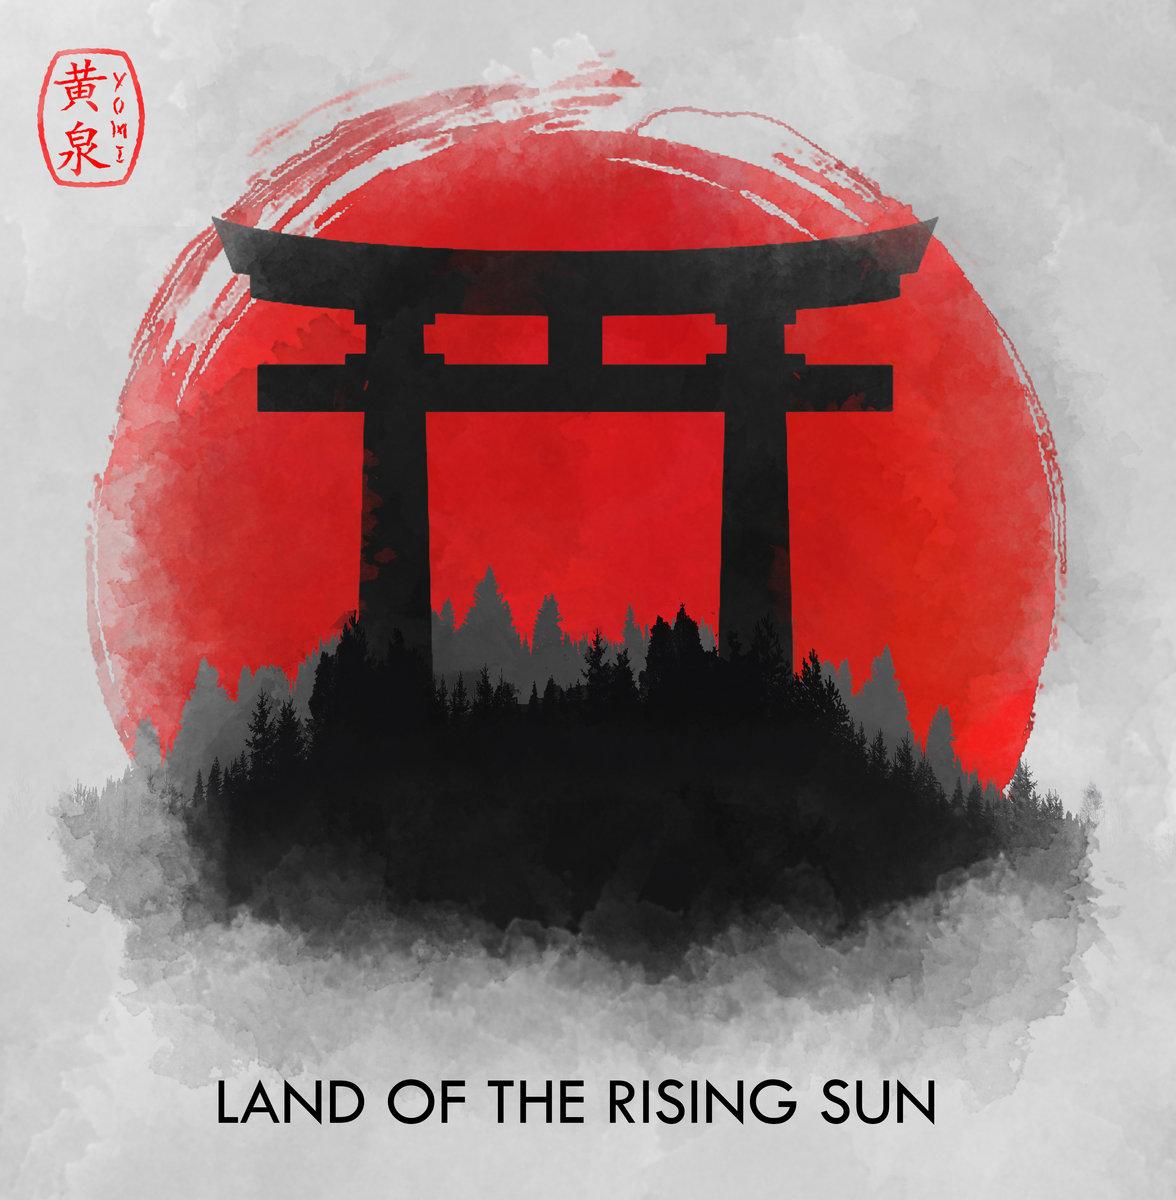 Land of the Rising Sun   Yomi